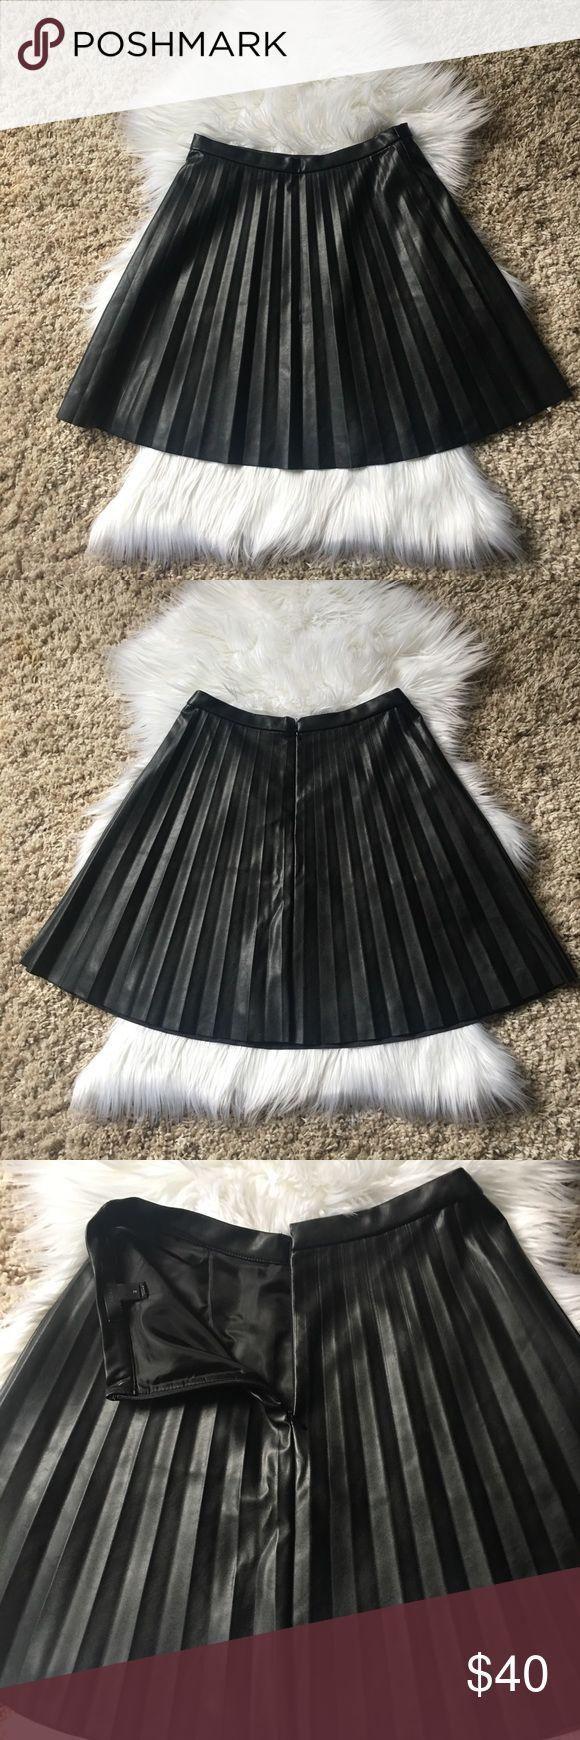 J.Crew Vegan Pleated A-Line Skirt NWOT Black J.Crew Vegan Pleated A-Line Skirt NWOT Black. Never worn, brand new w/o tags. Sits at waist, falls above the knee, hidden back zipper. Regular MSRP $98, Size 2. J. Crew Skirts A-Line or Full